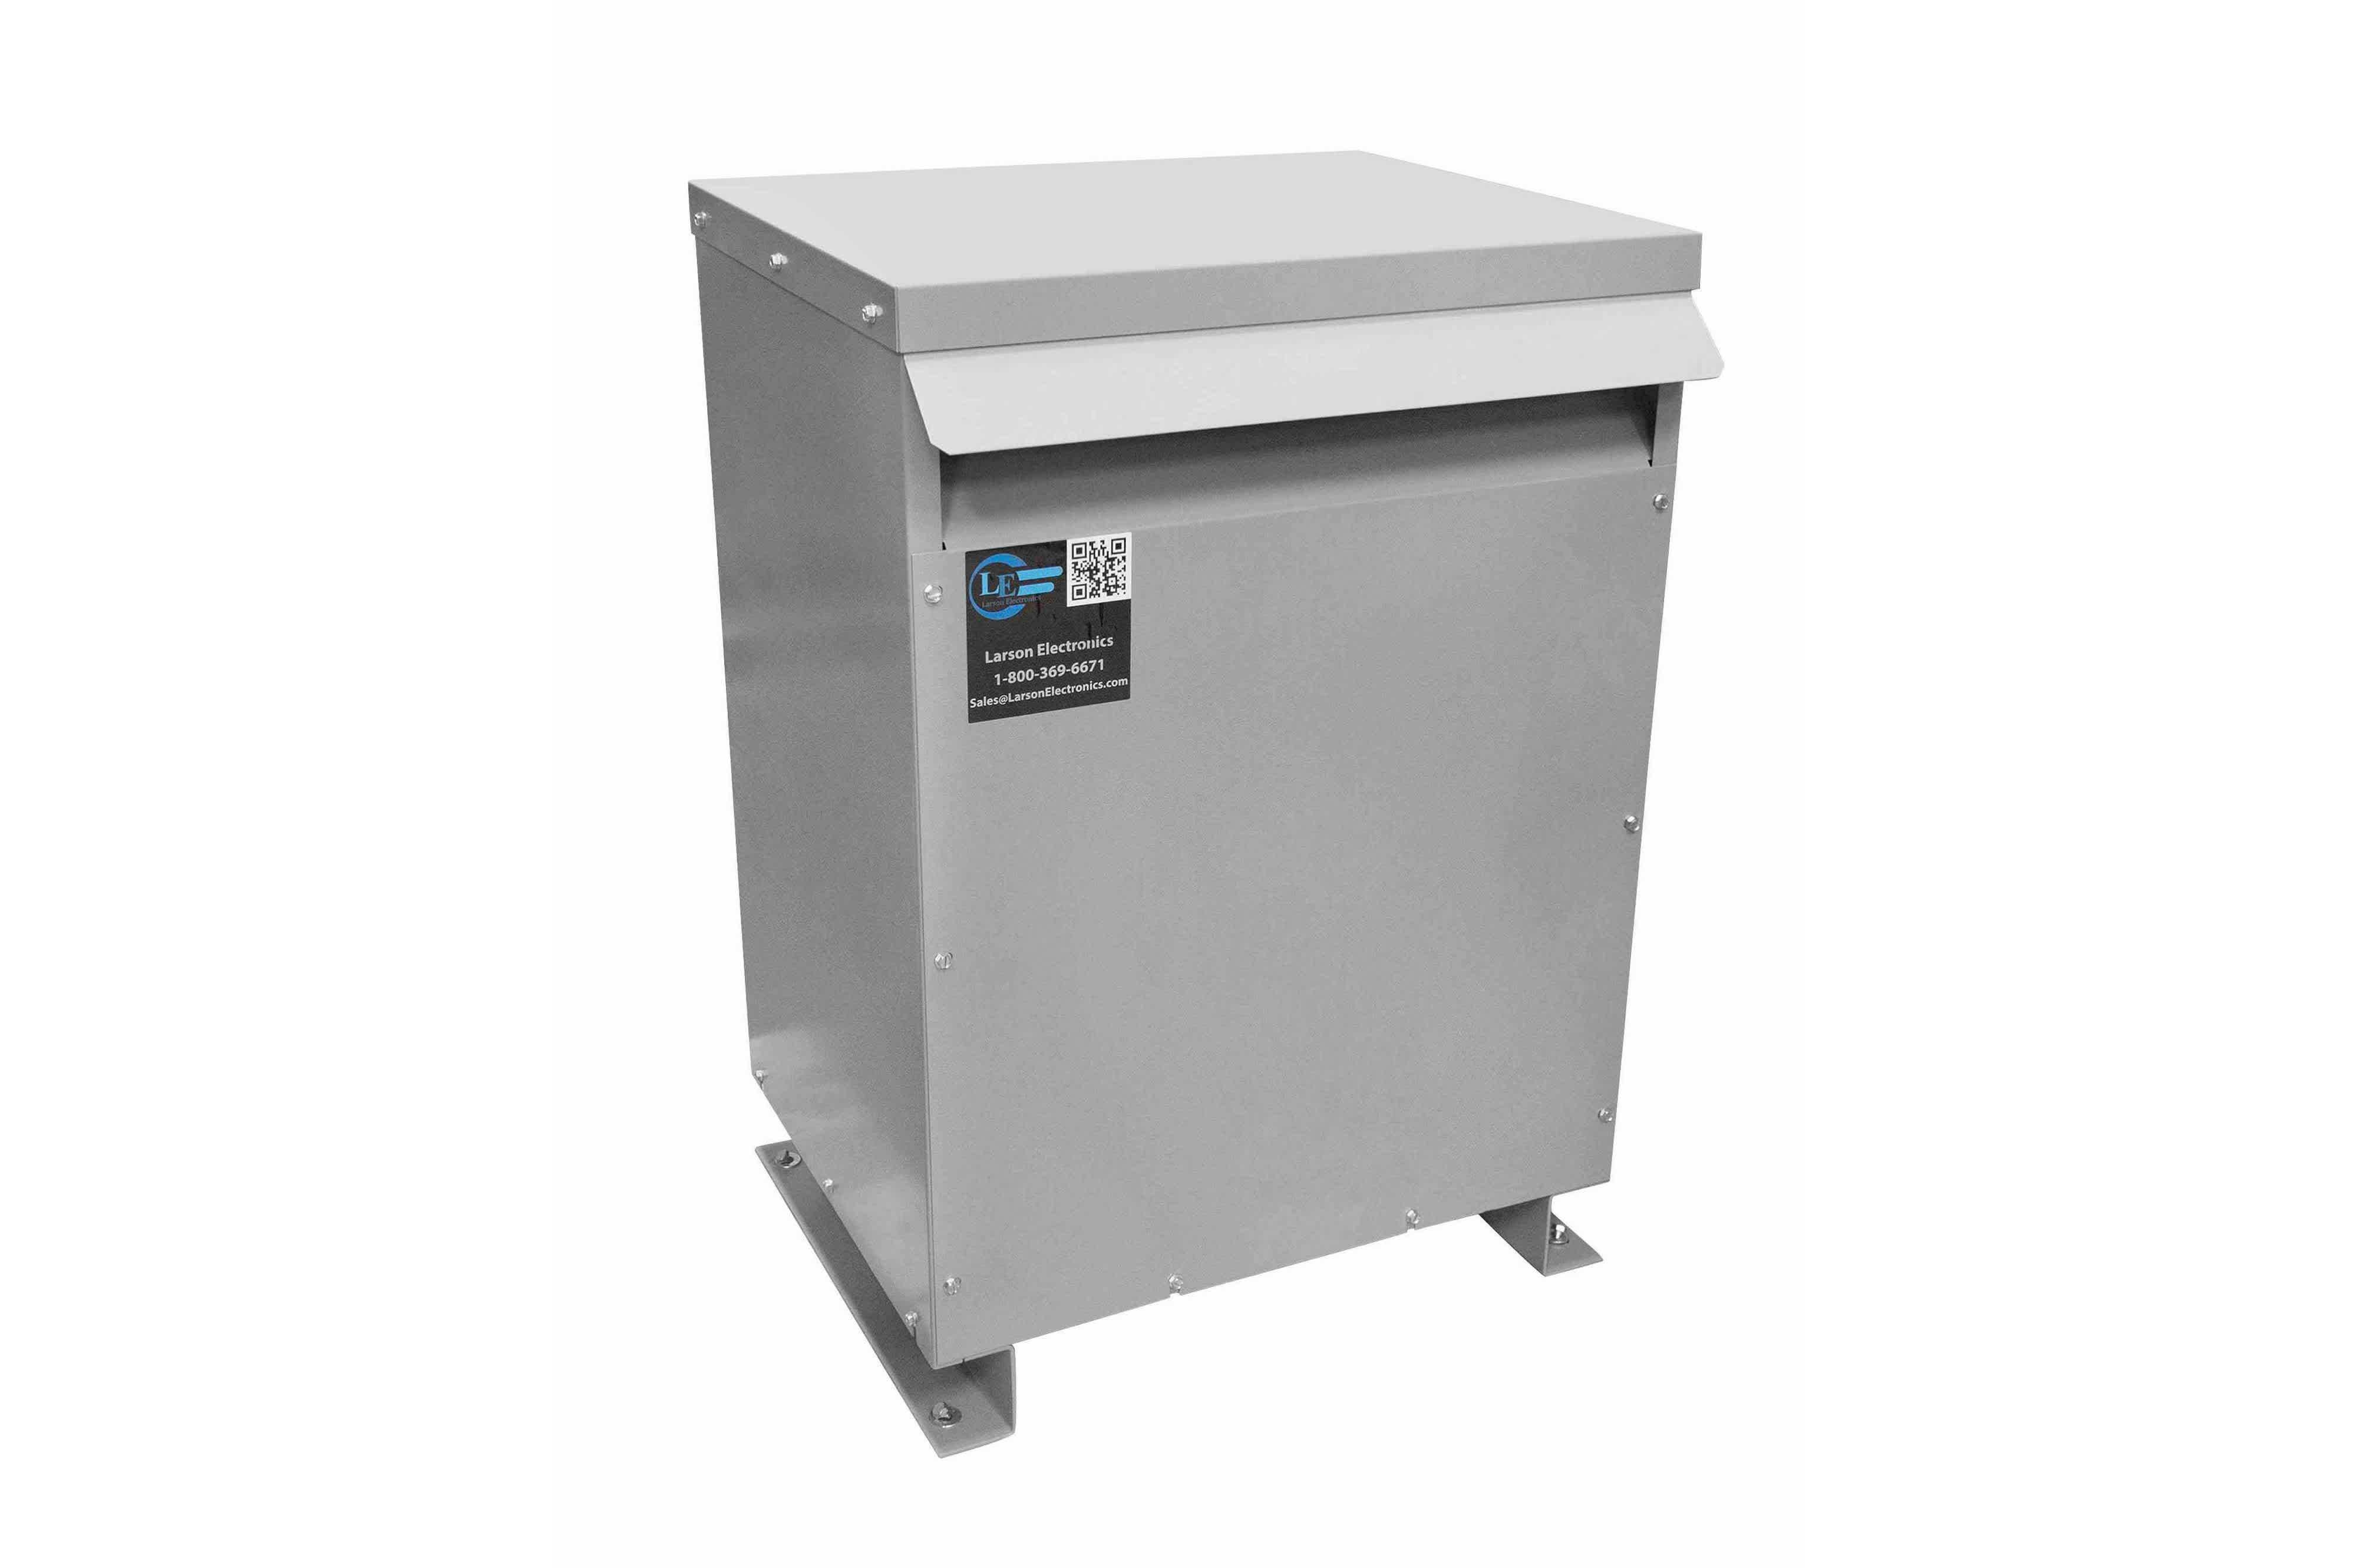 52.5 kVA 3PH Isolation Transformer, 400V Wye Primary, 240V Delta Secondary, N3R, Ventilated, 60 Hz